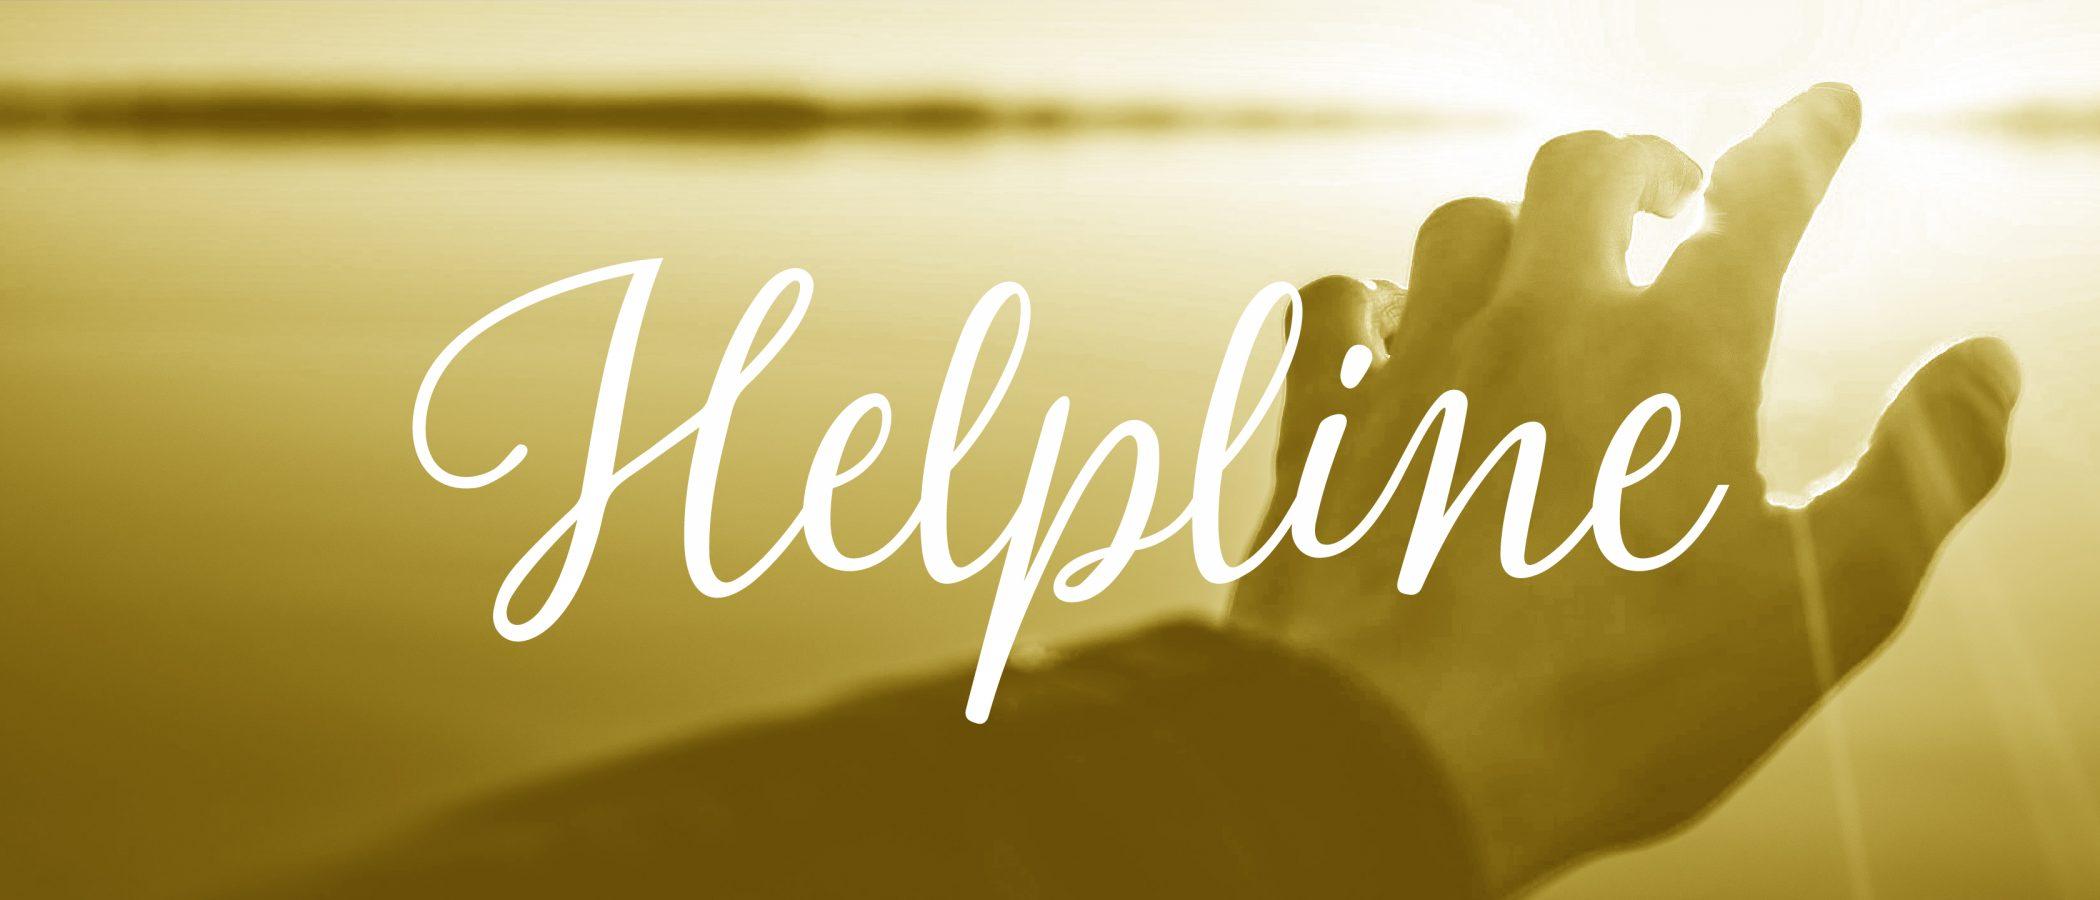 wellspring-helpline-10brd-dq2020-web-banner2x-100